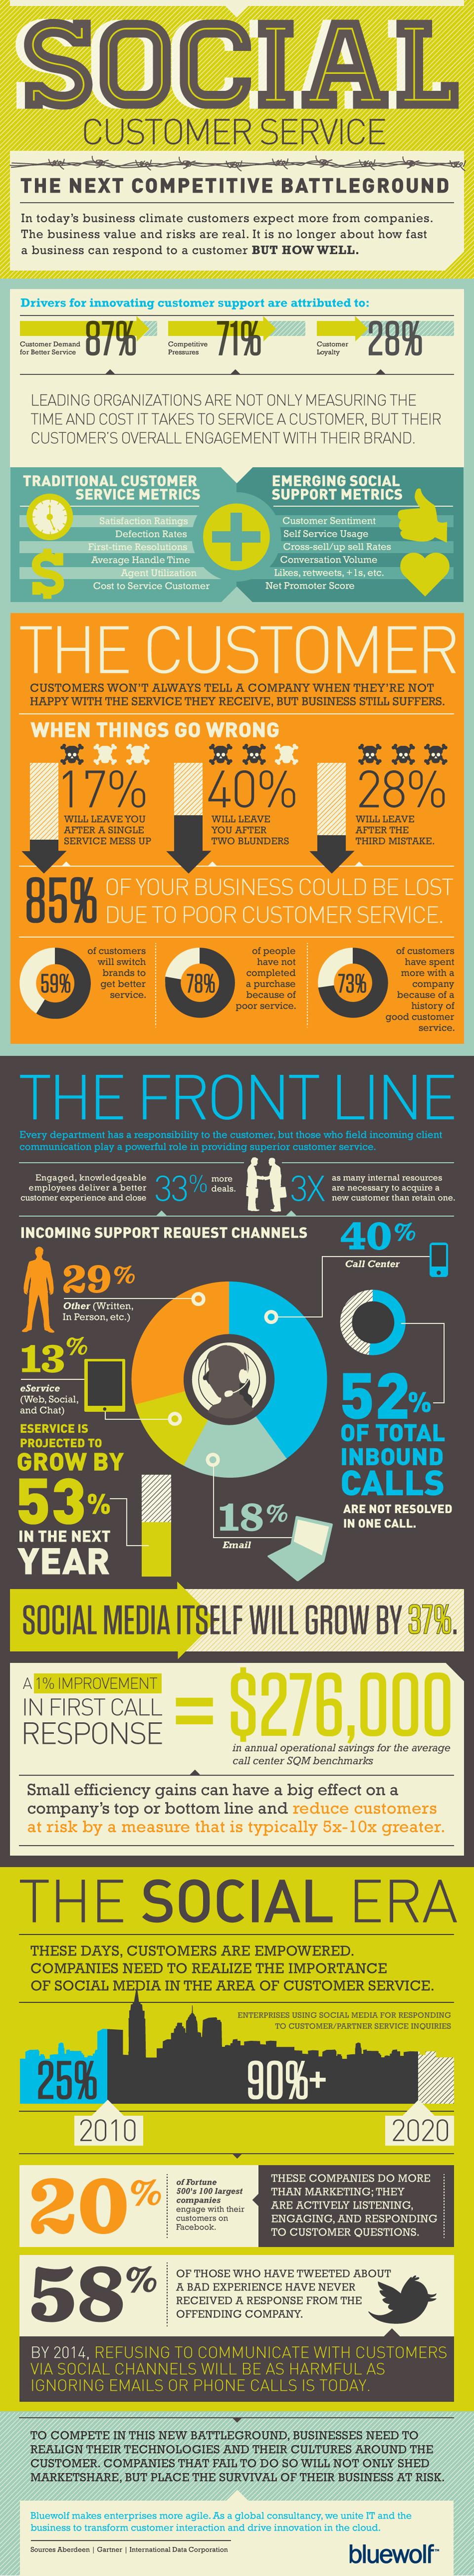 social media klantenservice infographic